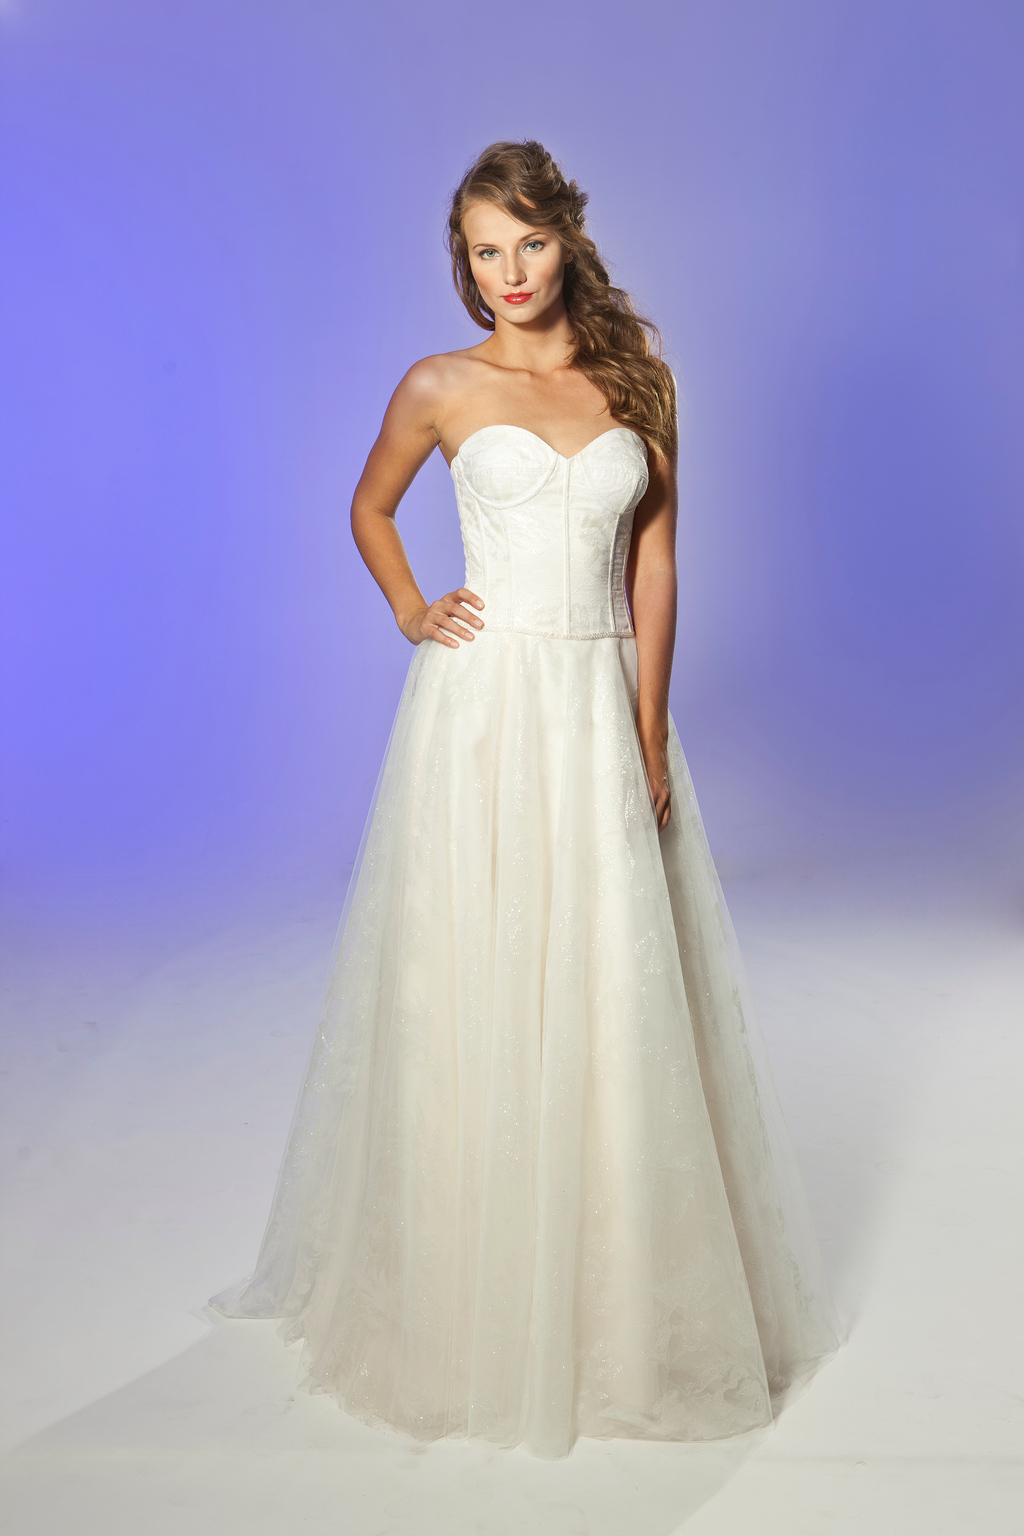 2013 wedding dress designer junko yoshioka glace 1